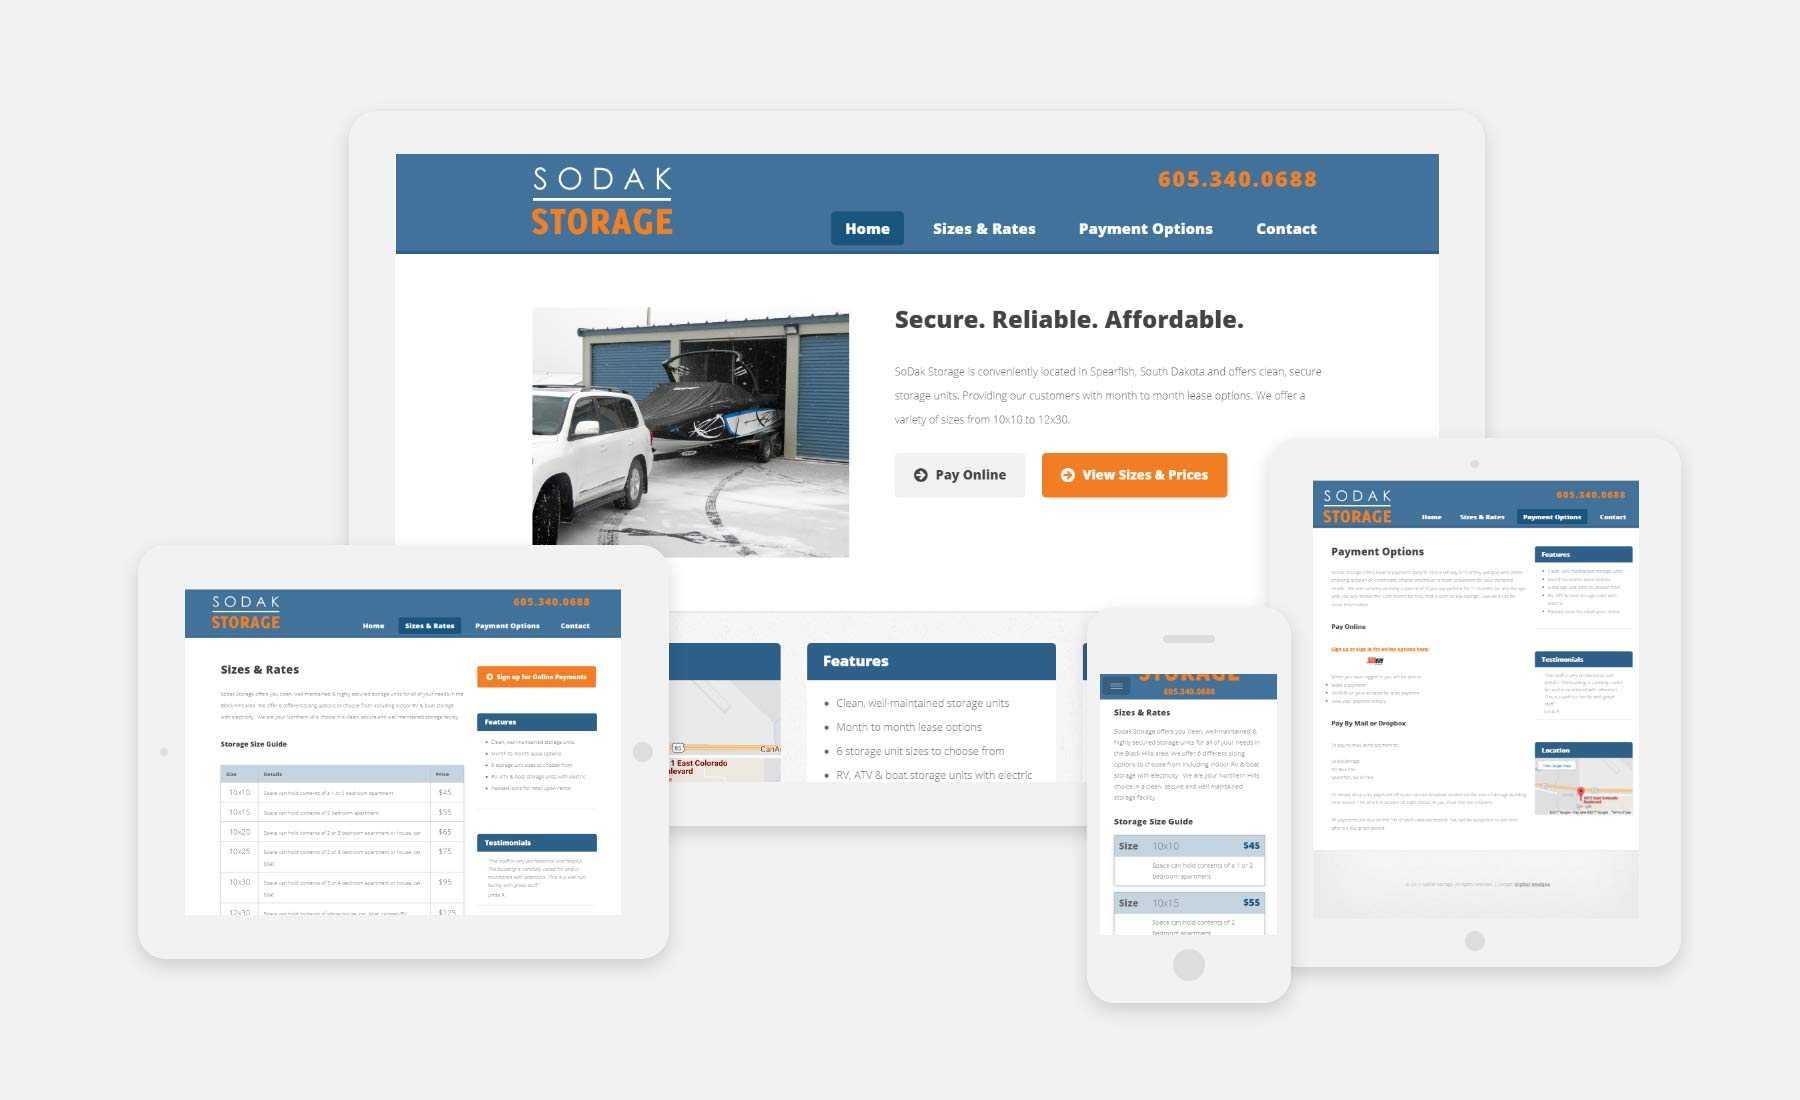 Sodak Storage responsive website shown on several devices